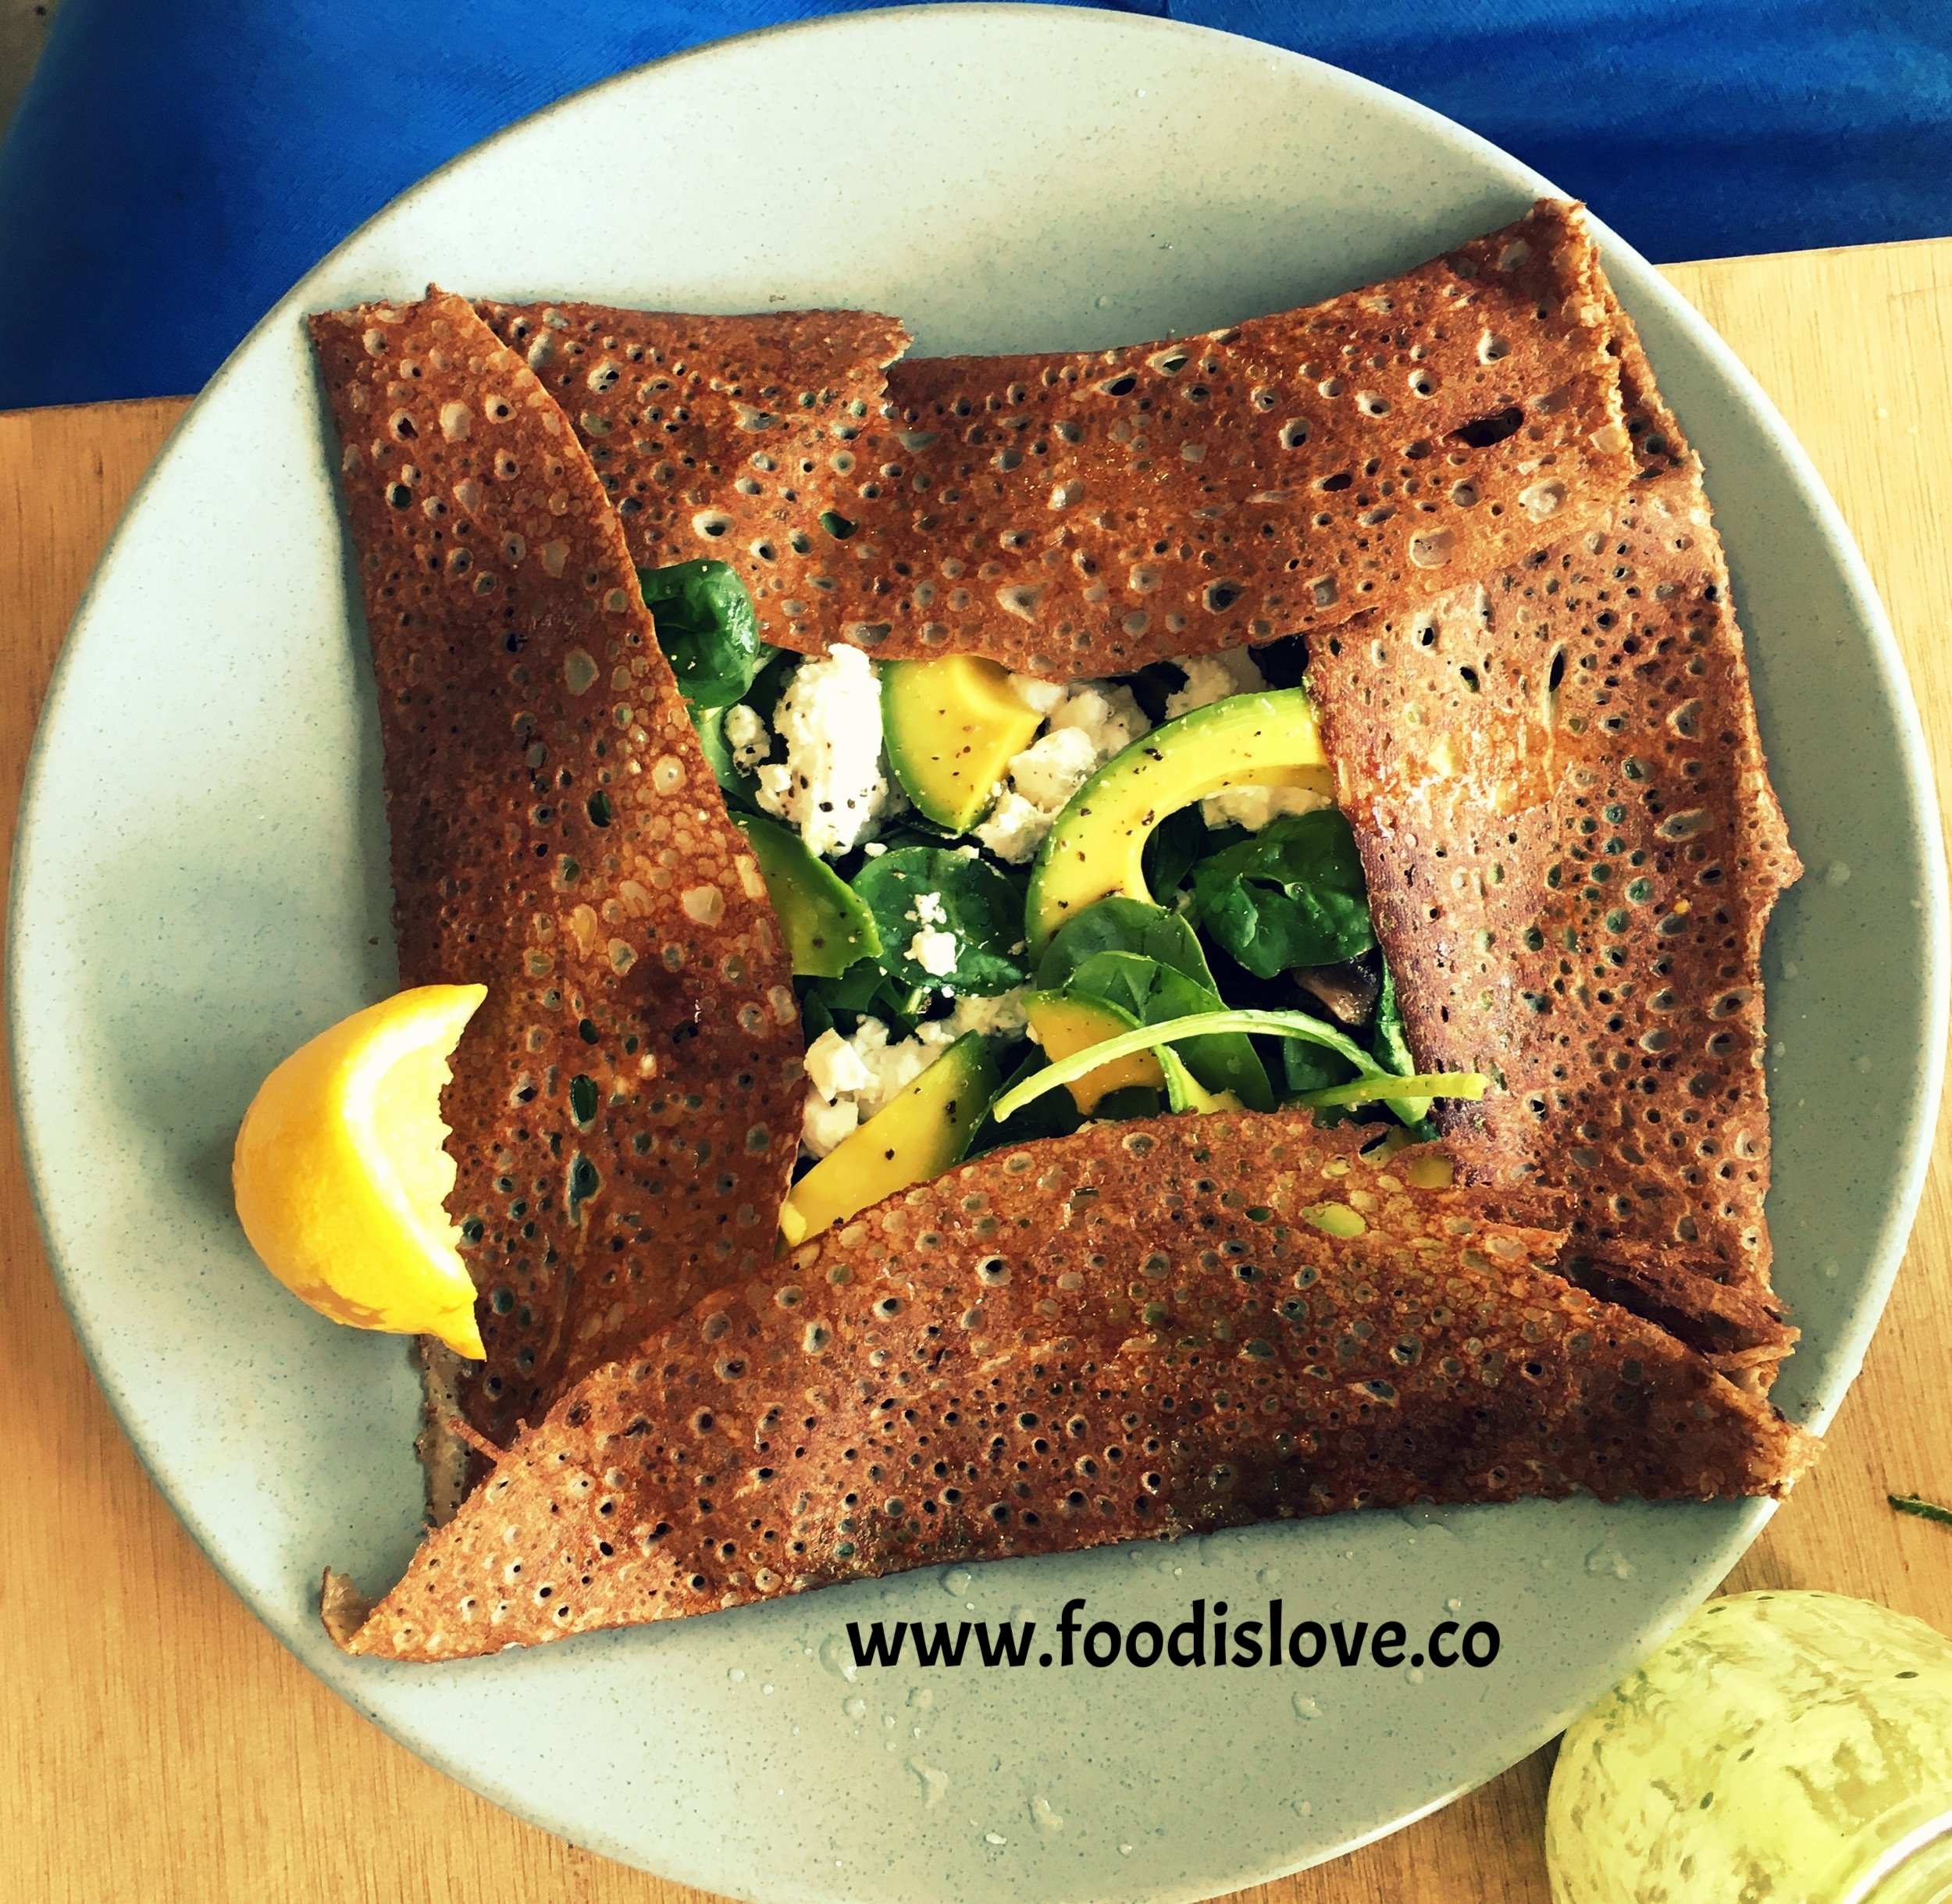 Gluten free buckwheat pancake filled with avocado, greens, feta and field mushrooms